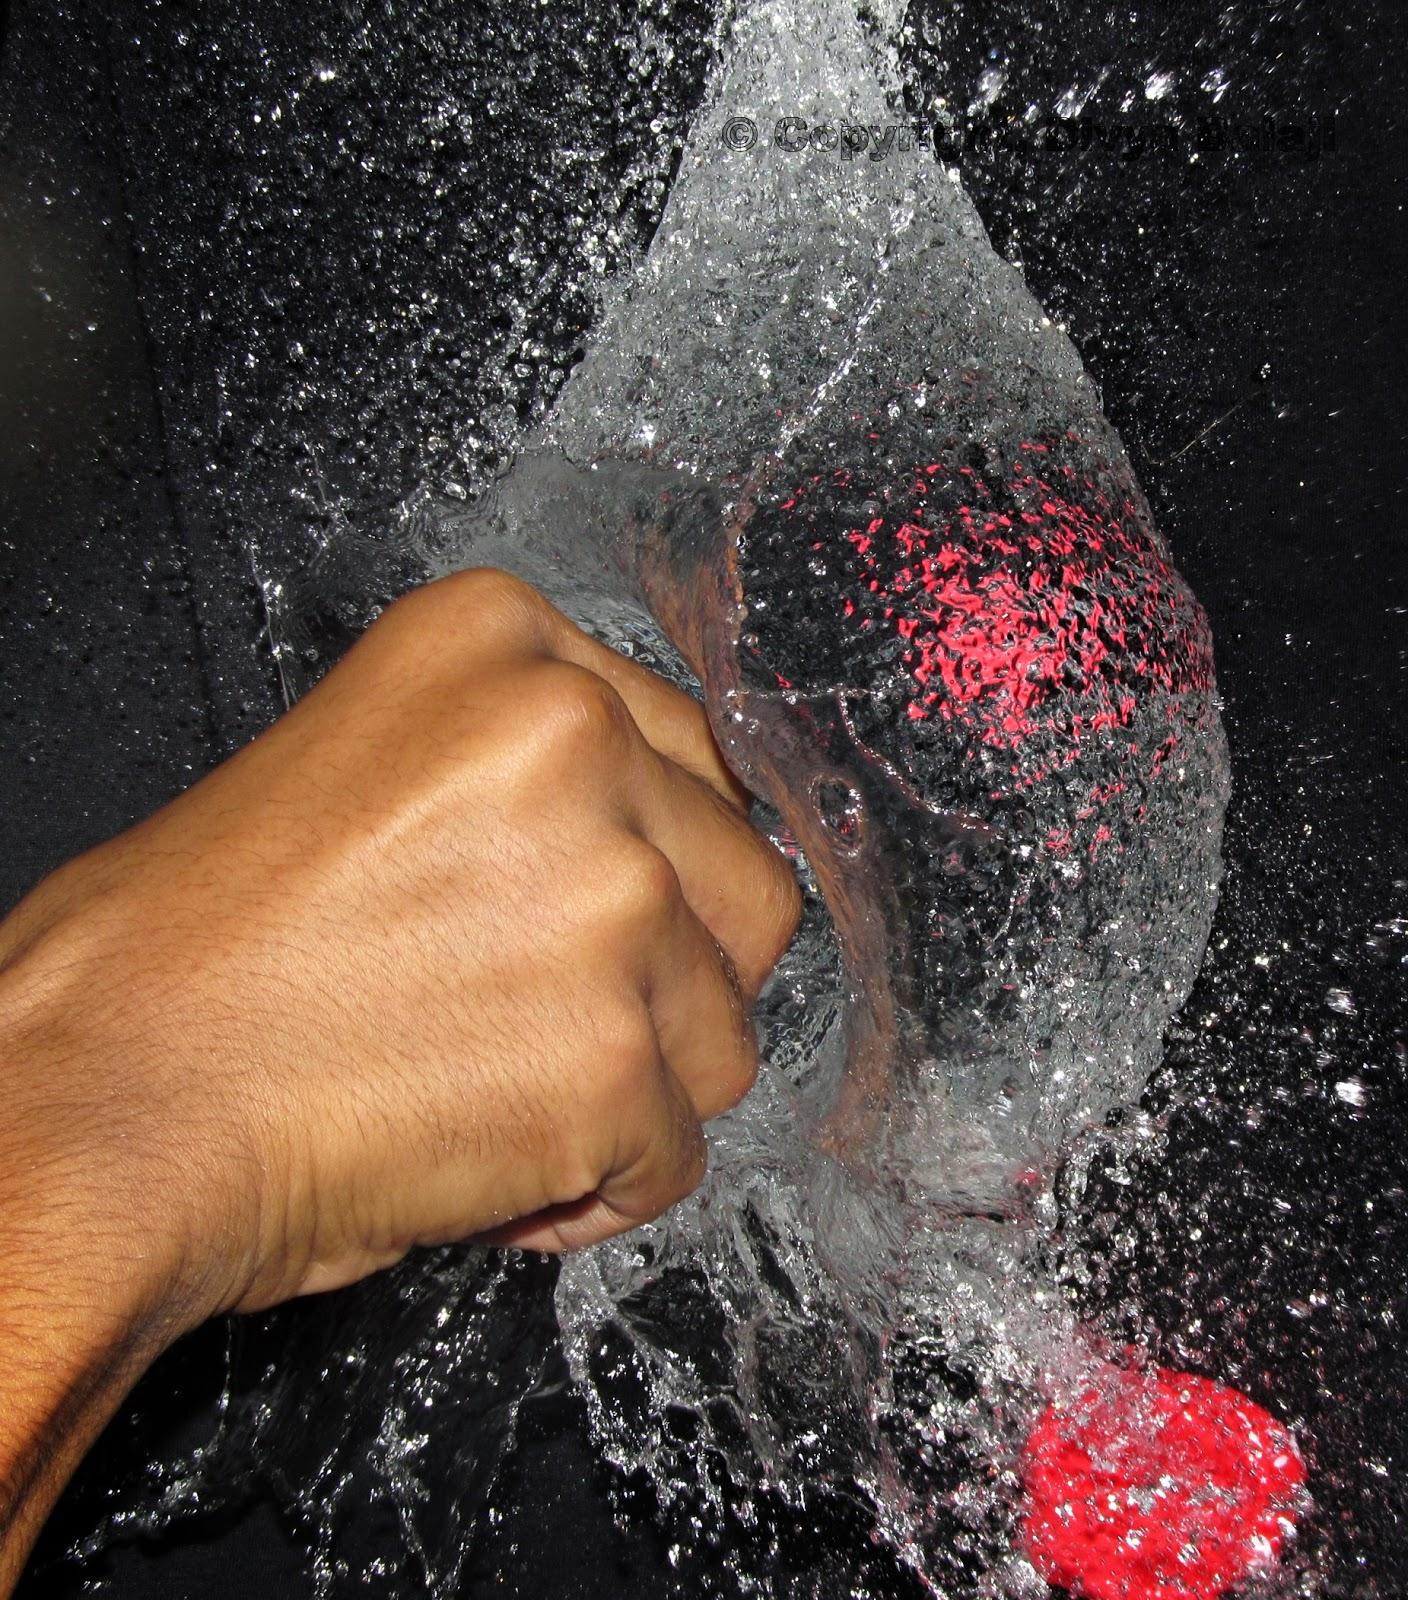 water balloon burst - punch